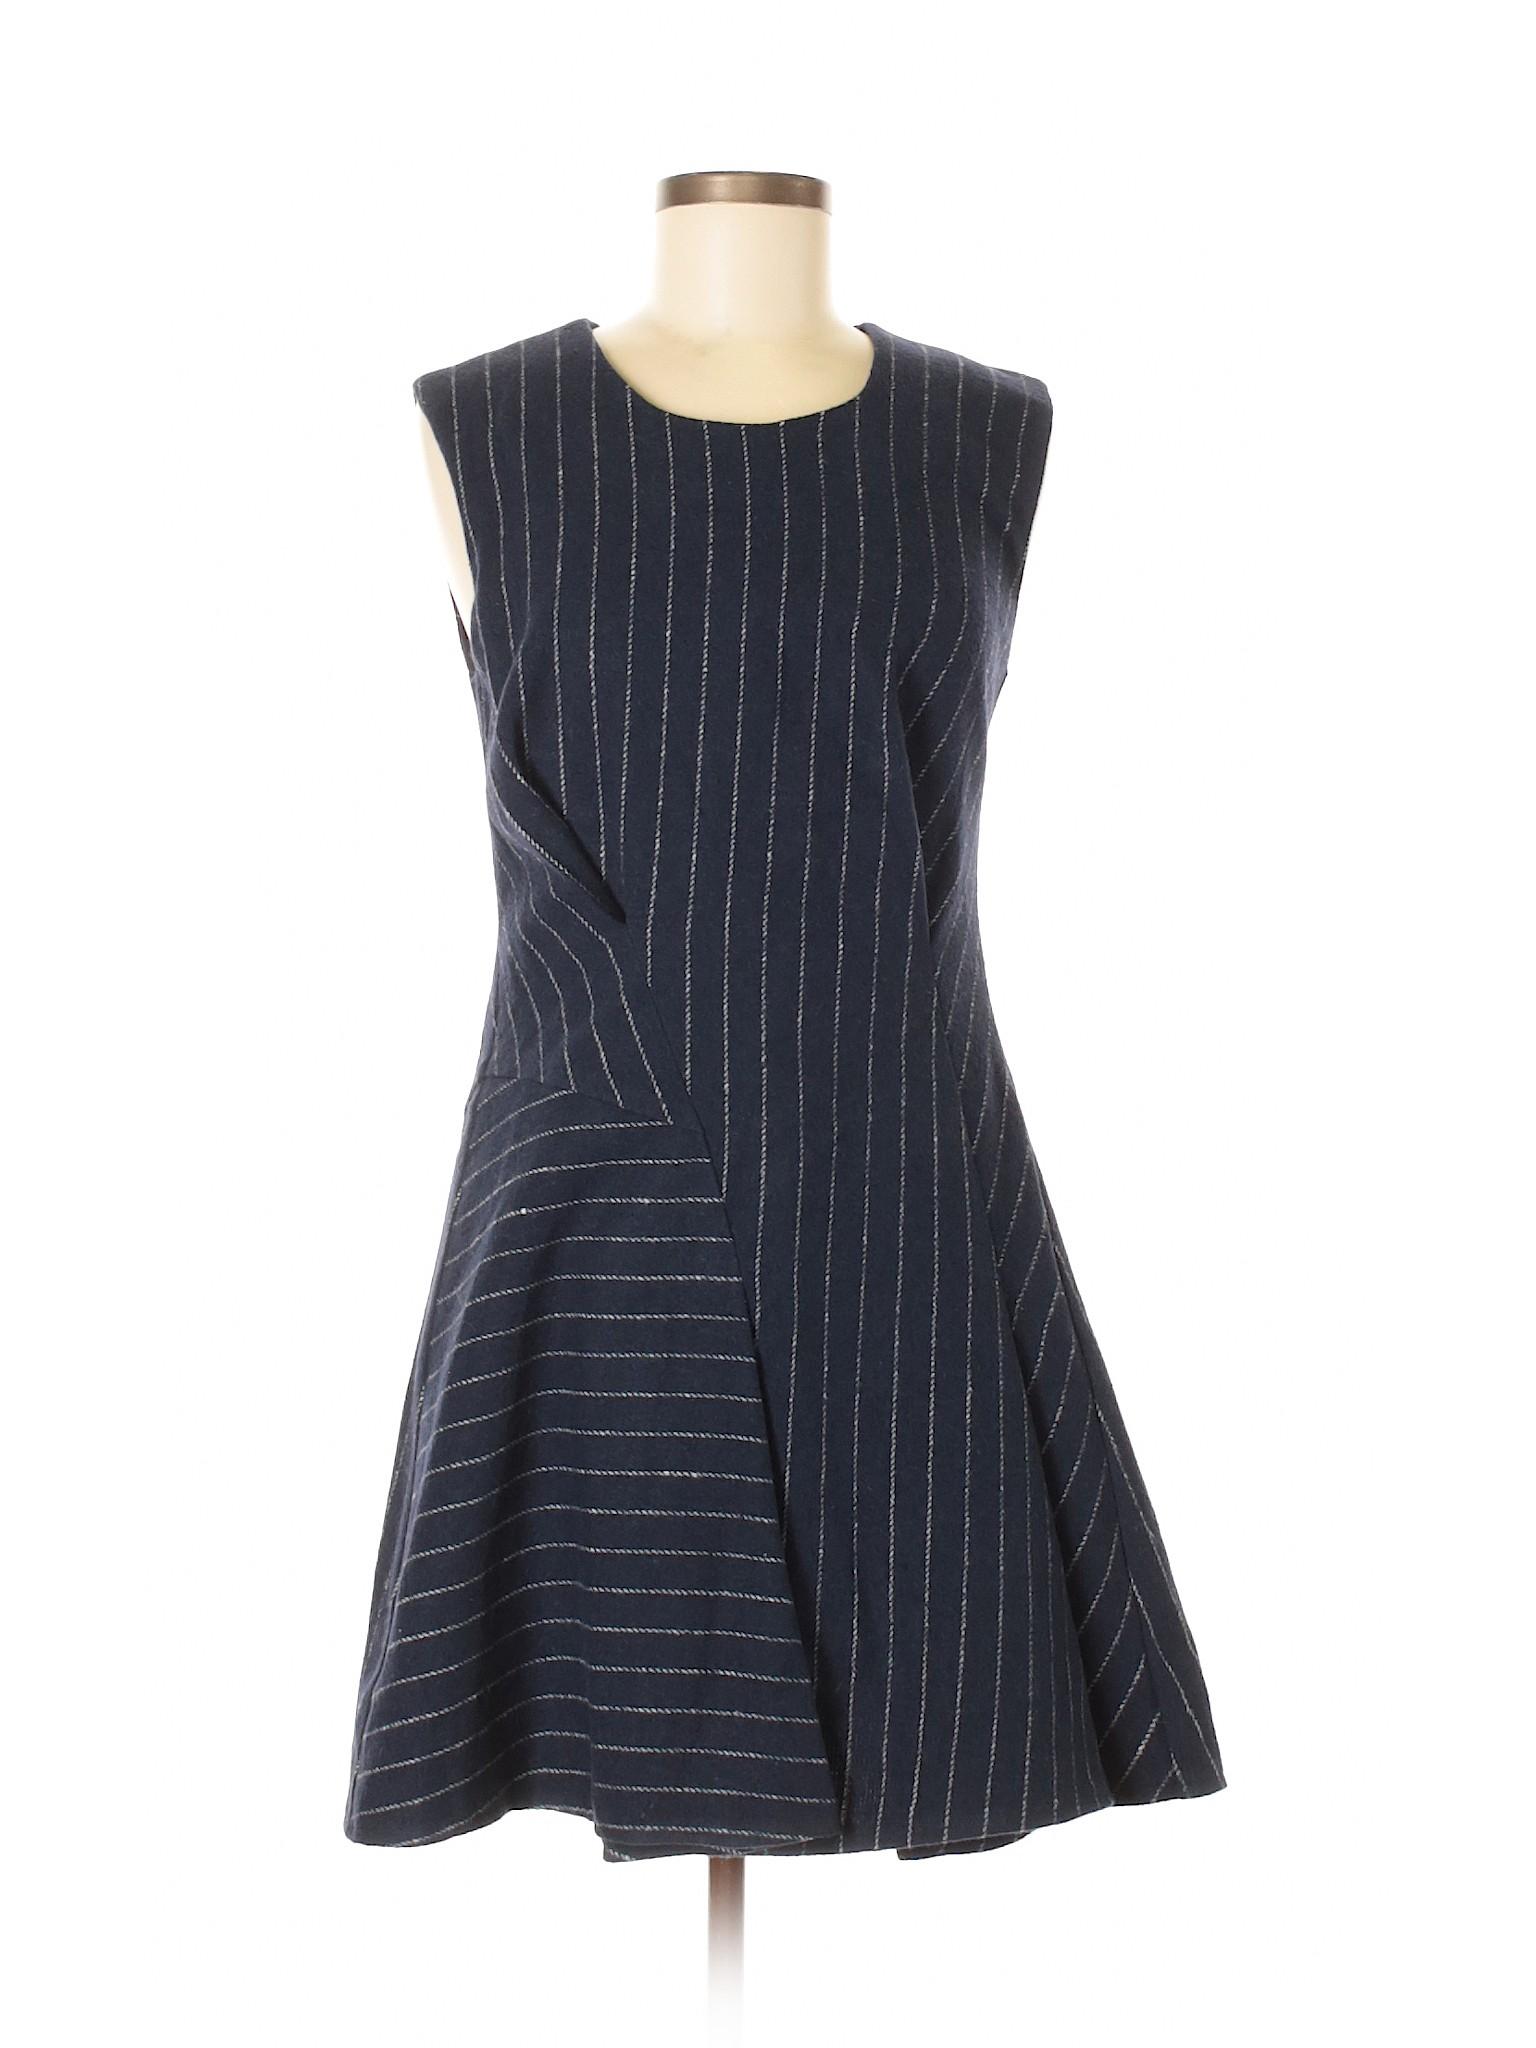 Casual JOA JOA Boutique Boutique winter winter Dress ZRXS17q